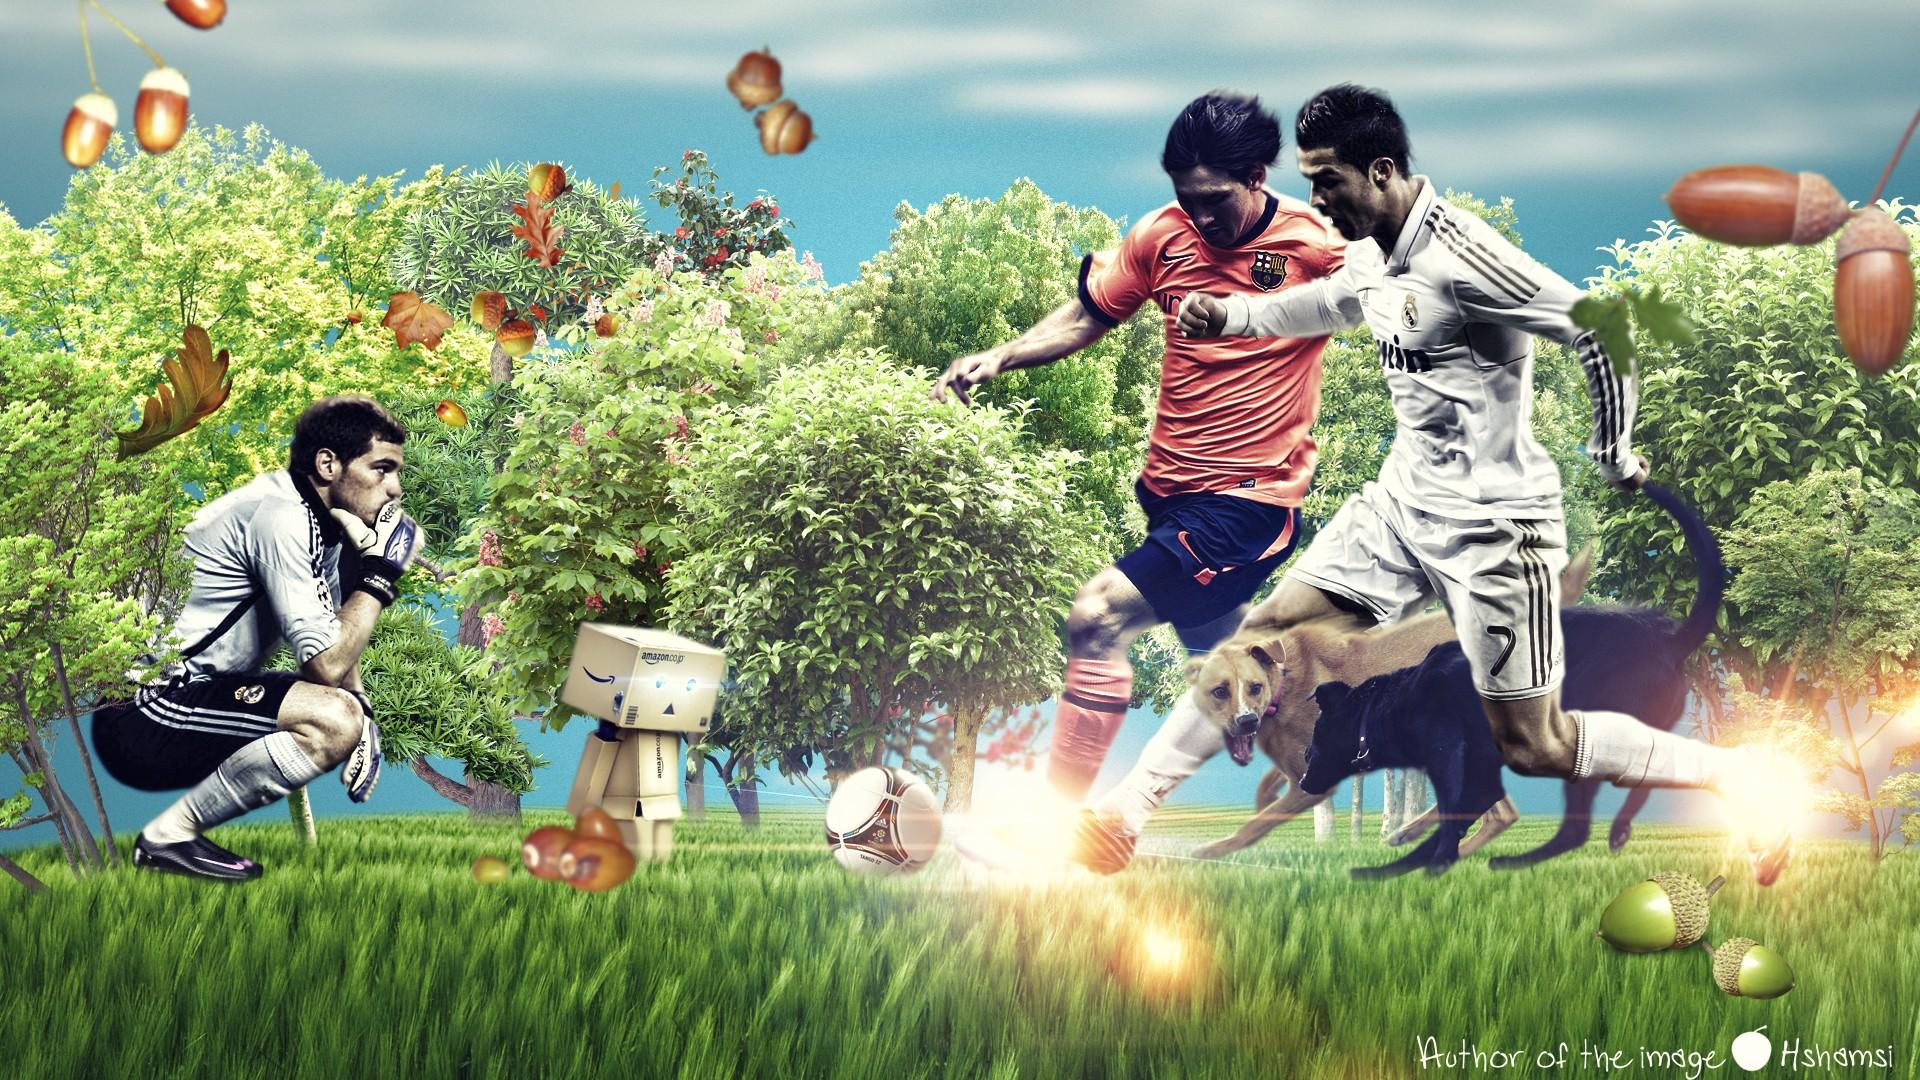 Sports Soccer Funny Real Madrid Lionel Messi Iker Casillas Cristiano